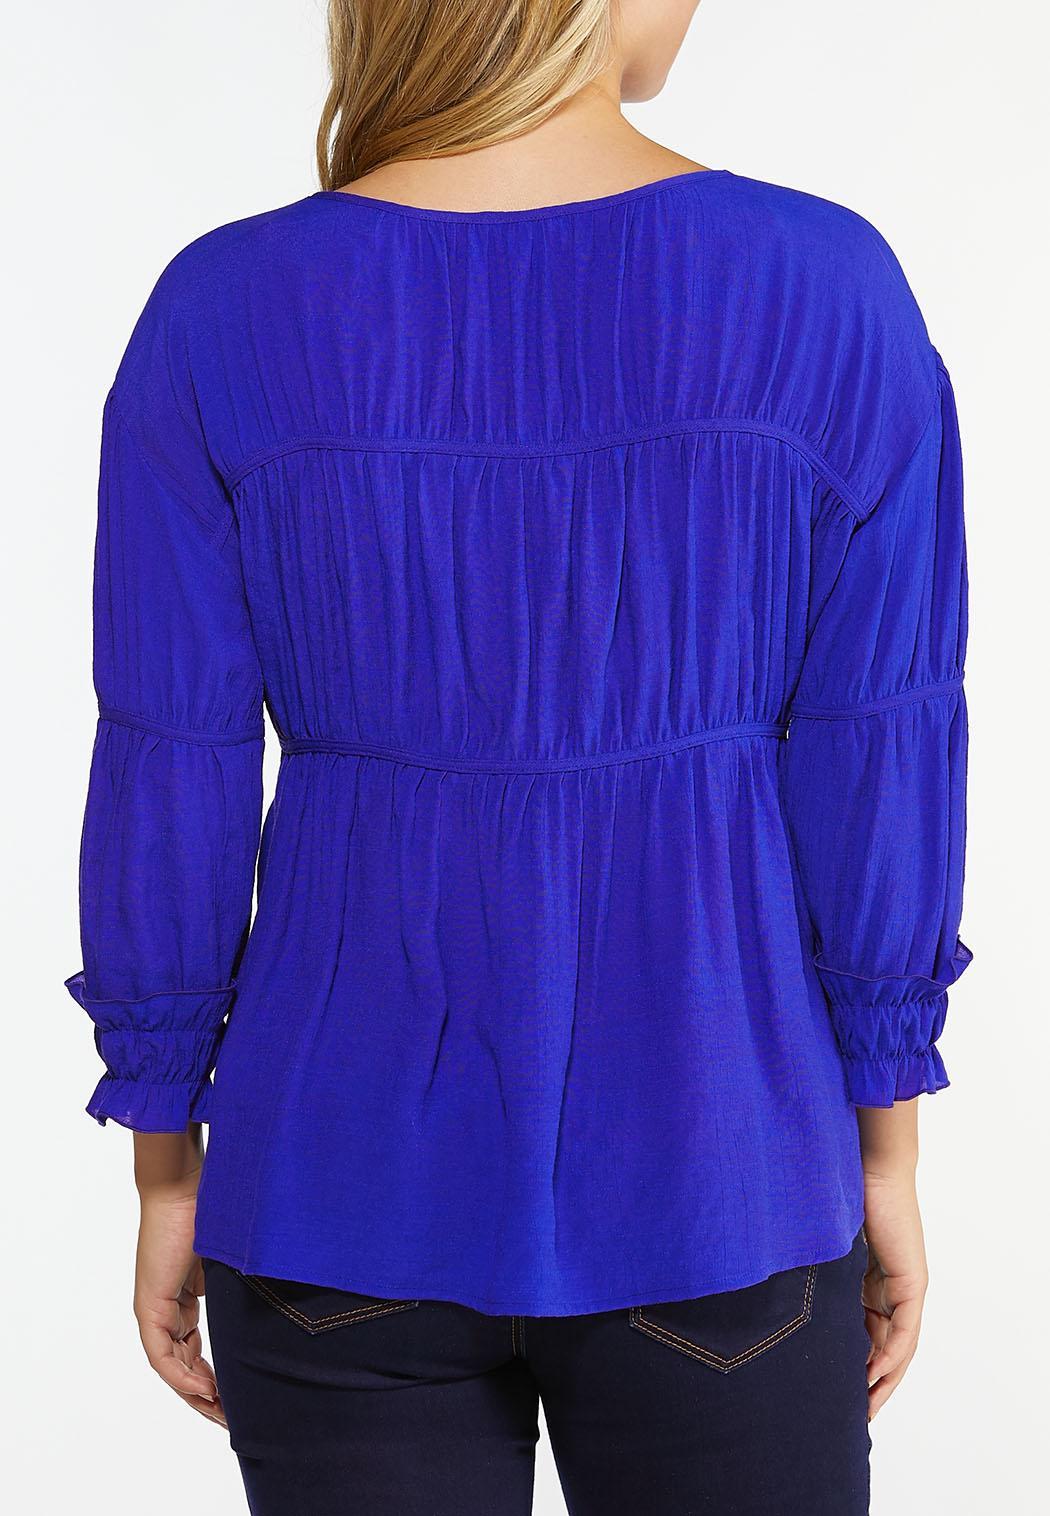 Gathered Blue Babydoll Top (Item #44447034)